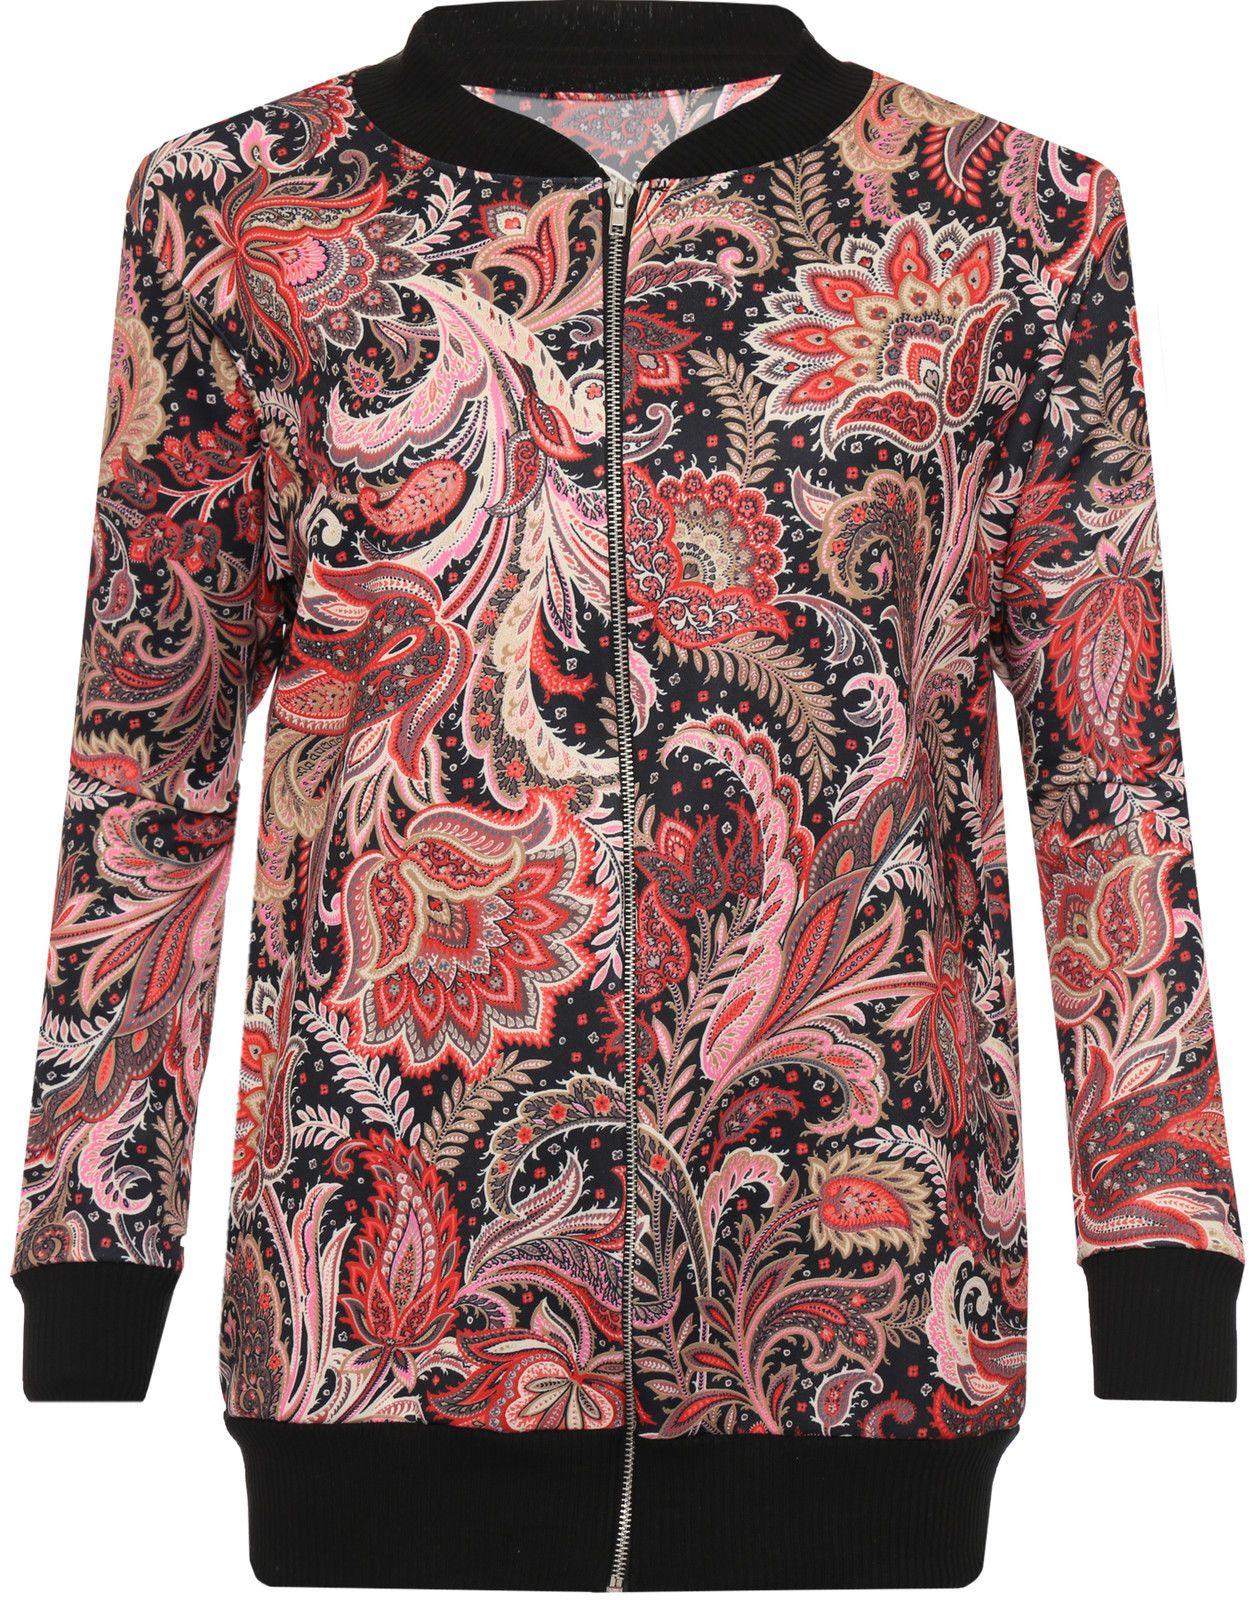 Womens Plus Floral Paisley Print Bomber Jacket Long Sleeve Zip Coat Top 14 28 Flower Print Bomber Jacket Floral Print Jacket Paisley Fashion [ 1600 x 1255 Pixel ]